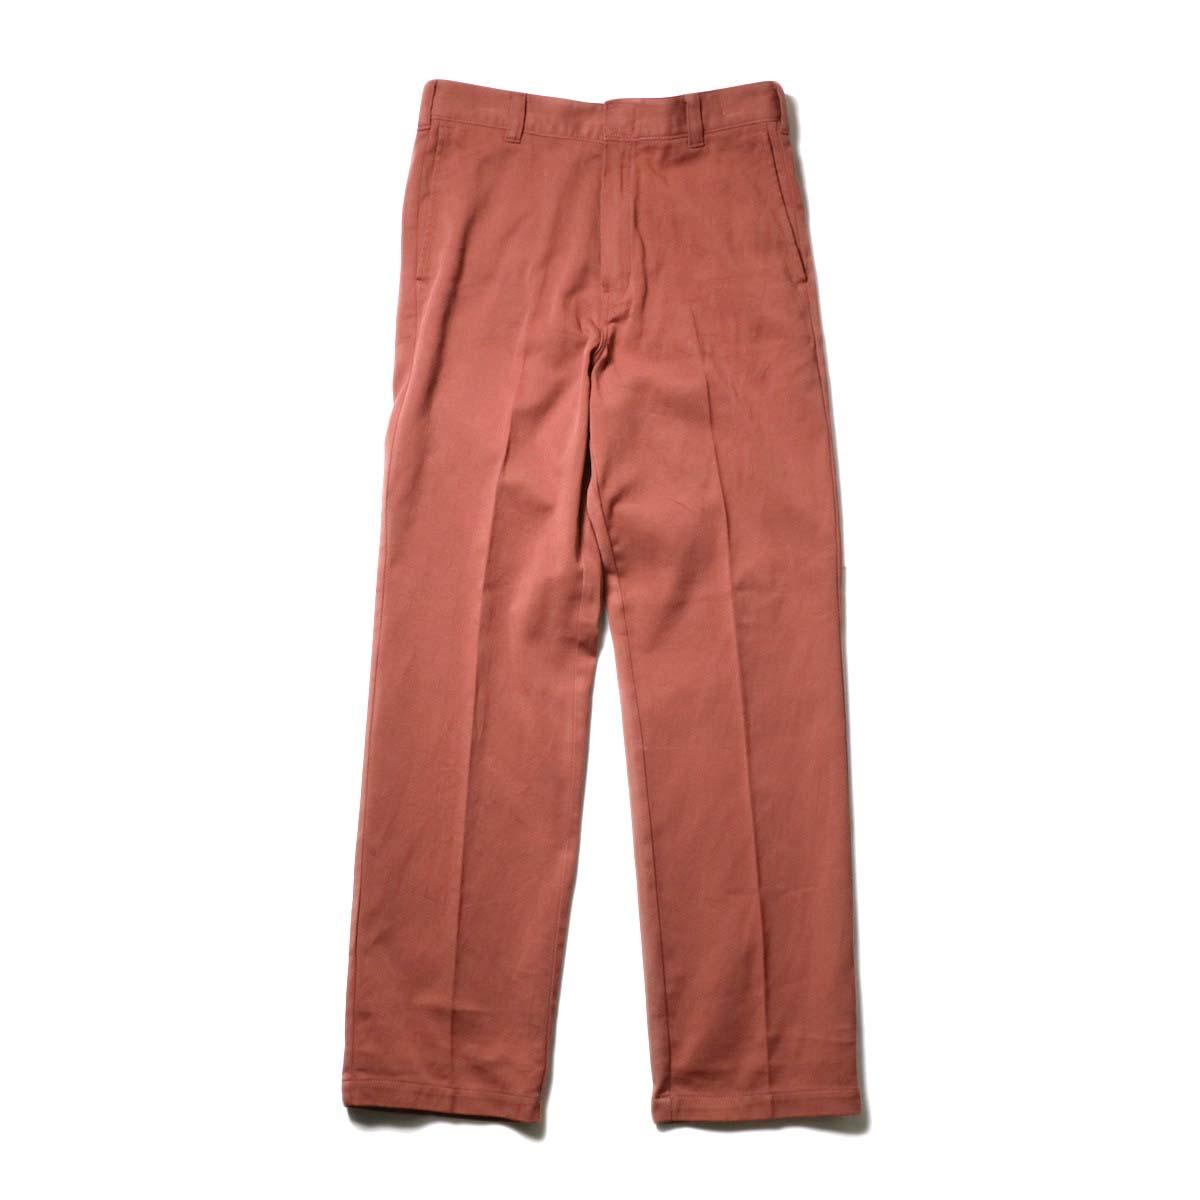 UNUSED × Dickies / UW0939 Cotton Linen Trousers (Orange)